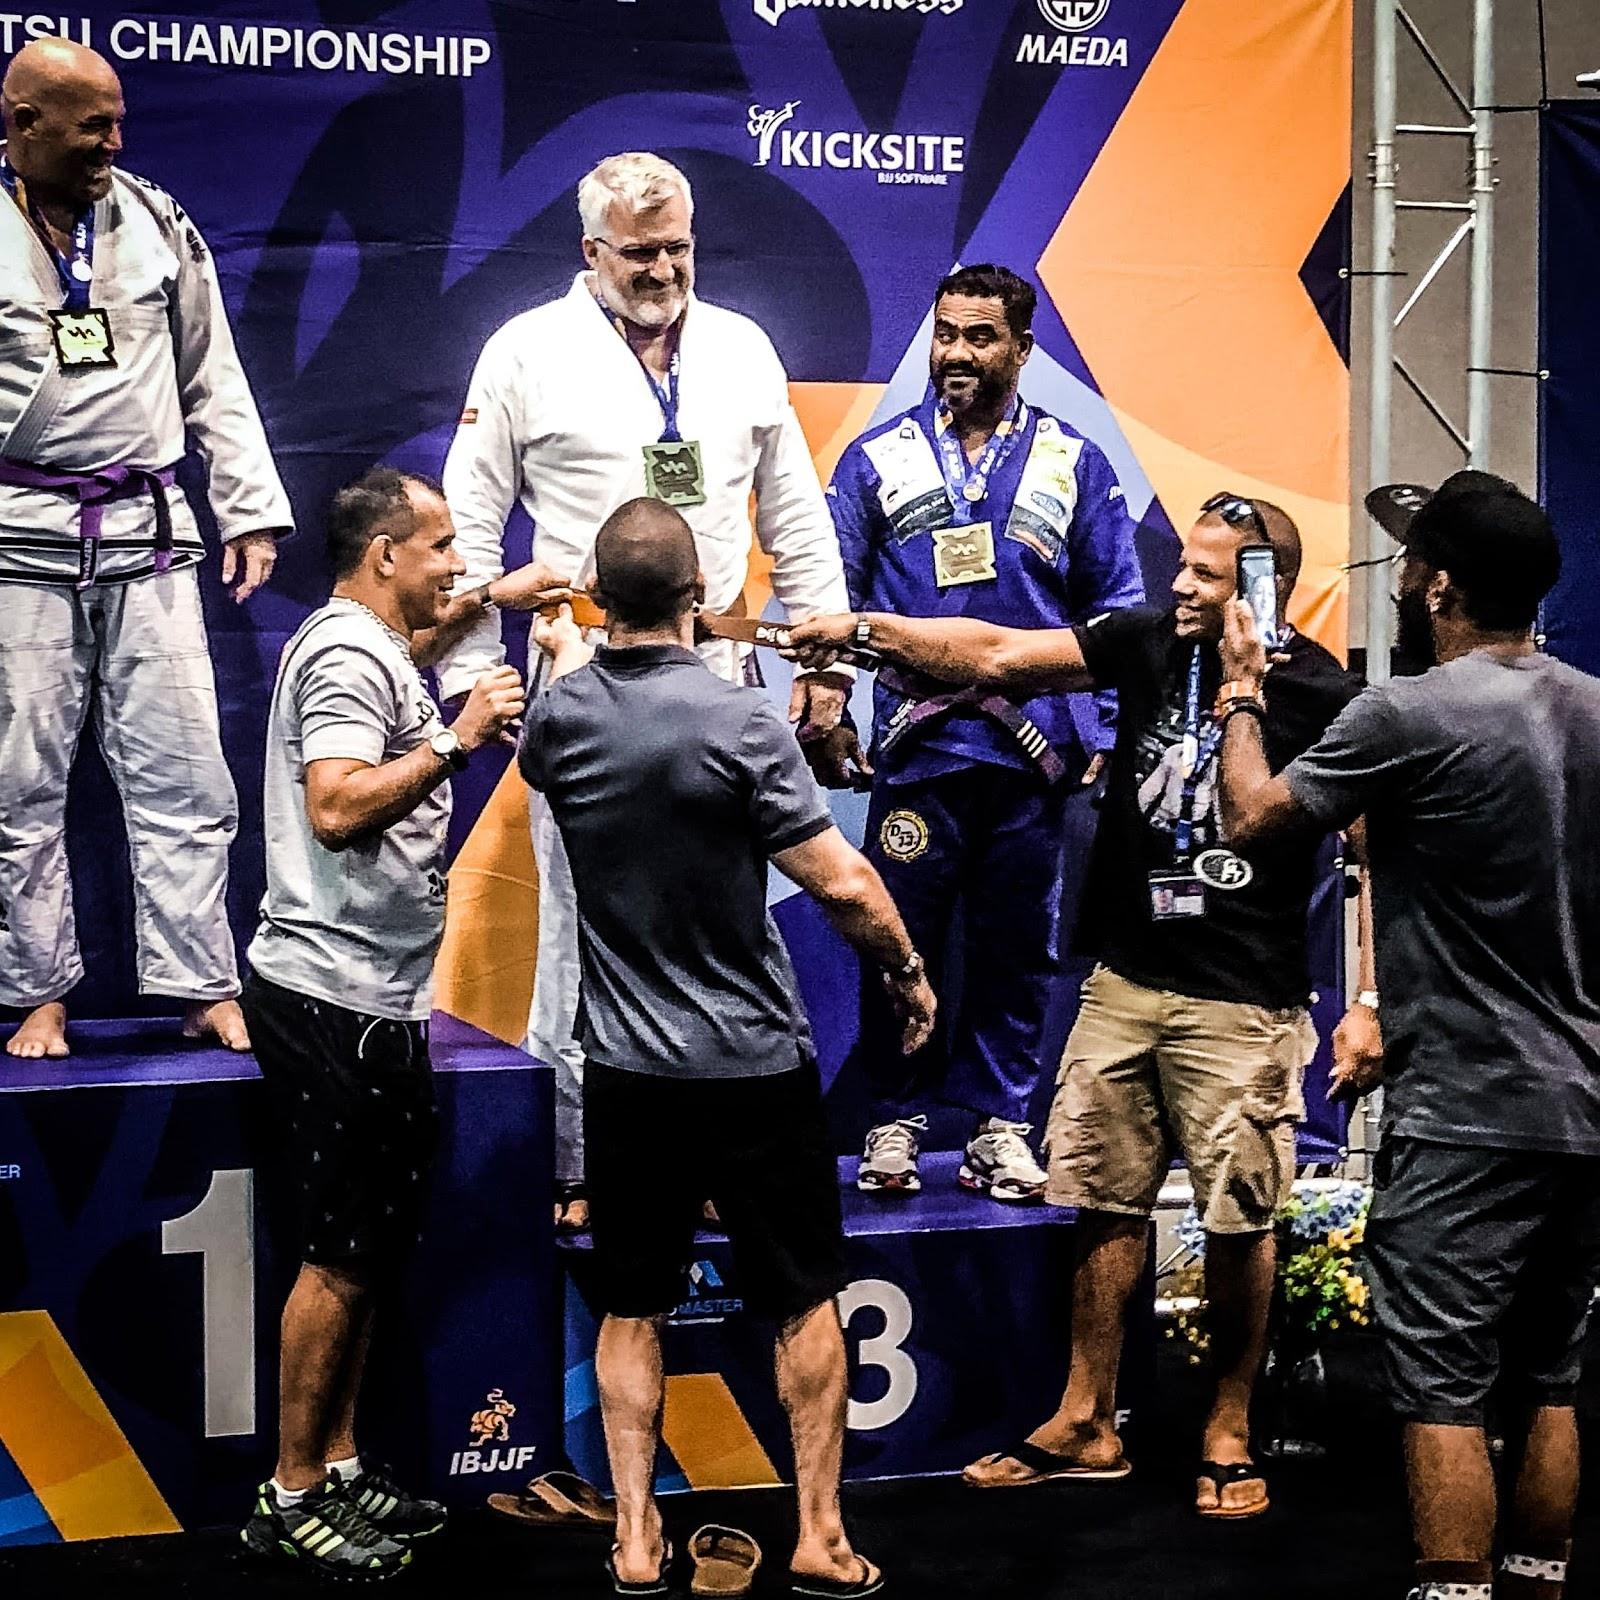 Jimbo Gets Bronze IBJJF Masters Worlds 2018. Charlotte Jiu-Jitsu Academy, GFT, Mau Mau, Arte Suave Jiu Jitsu, BJJ, Brazilian Jiu-Jitsu, 2018, Brown Belt Promotion